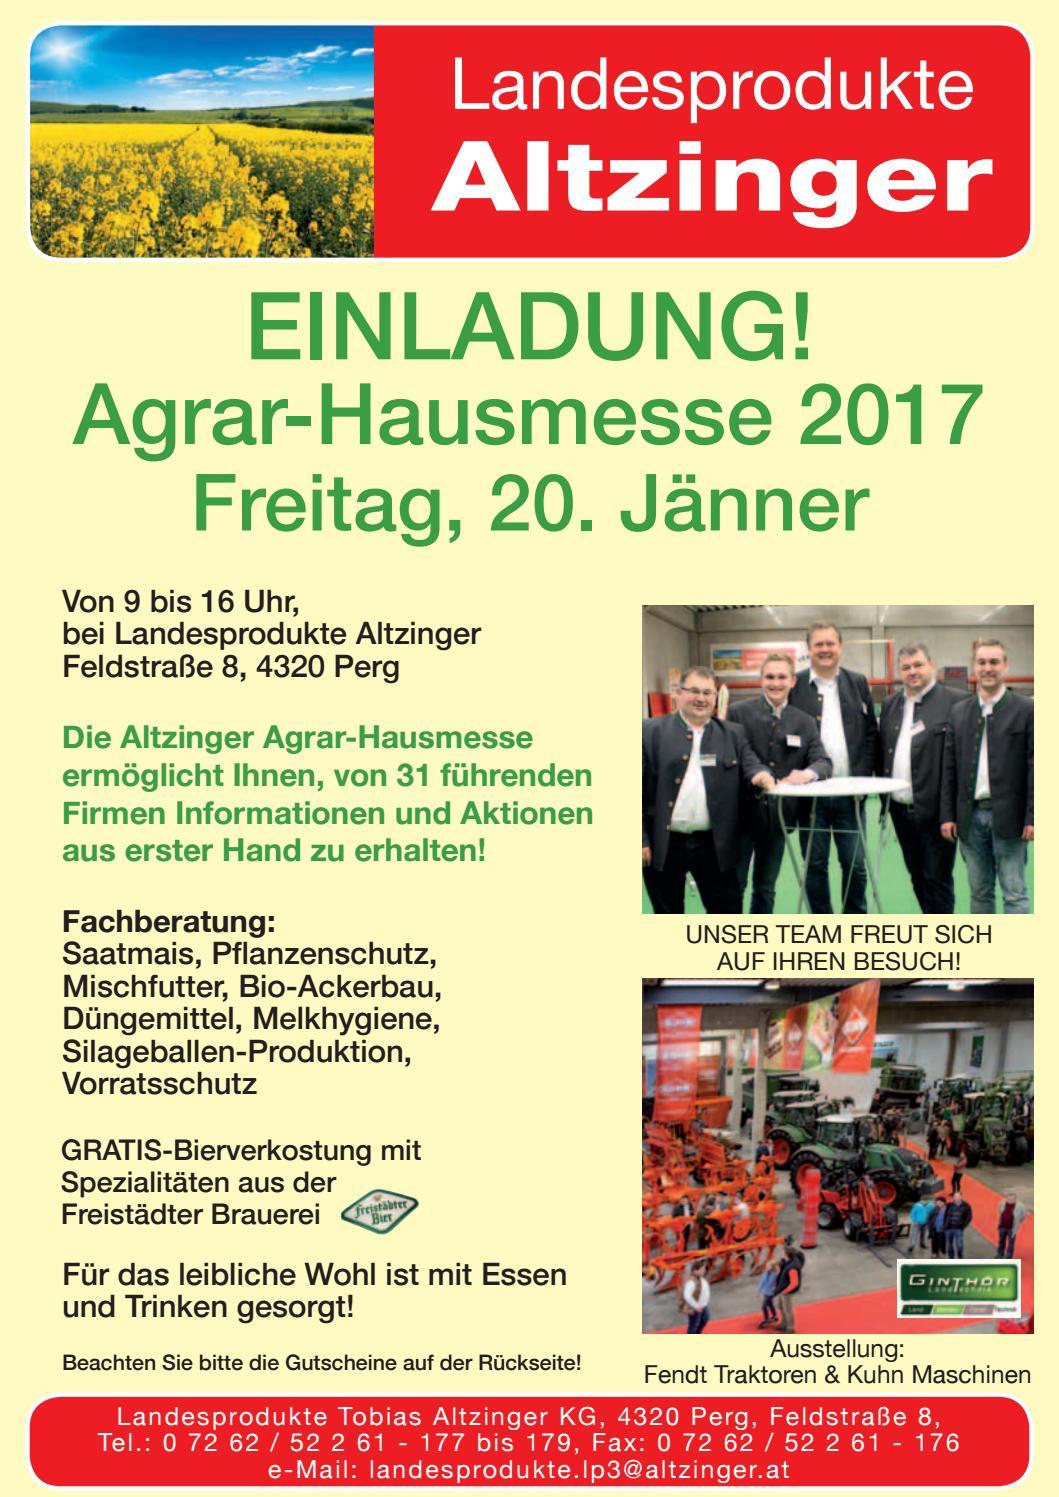 altzinger einladung - agrartag 2017 by busta + neumayr og - issuu, Einladungsentwurf